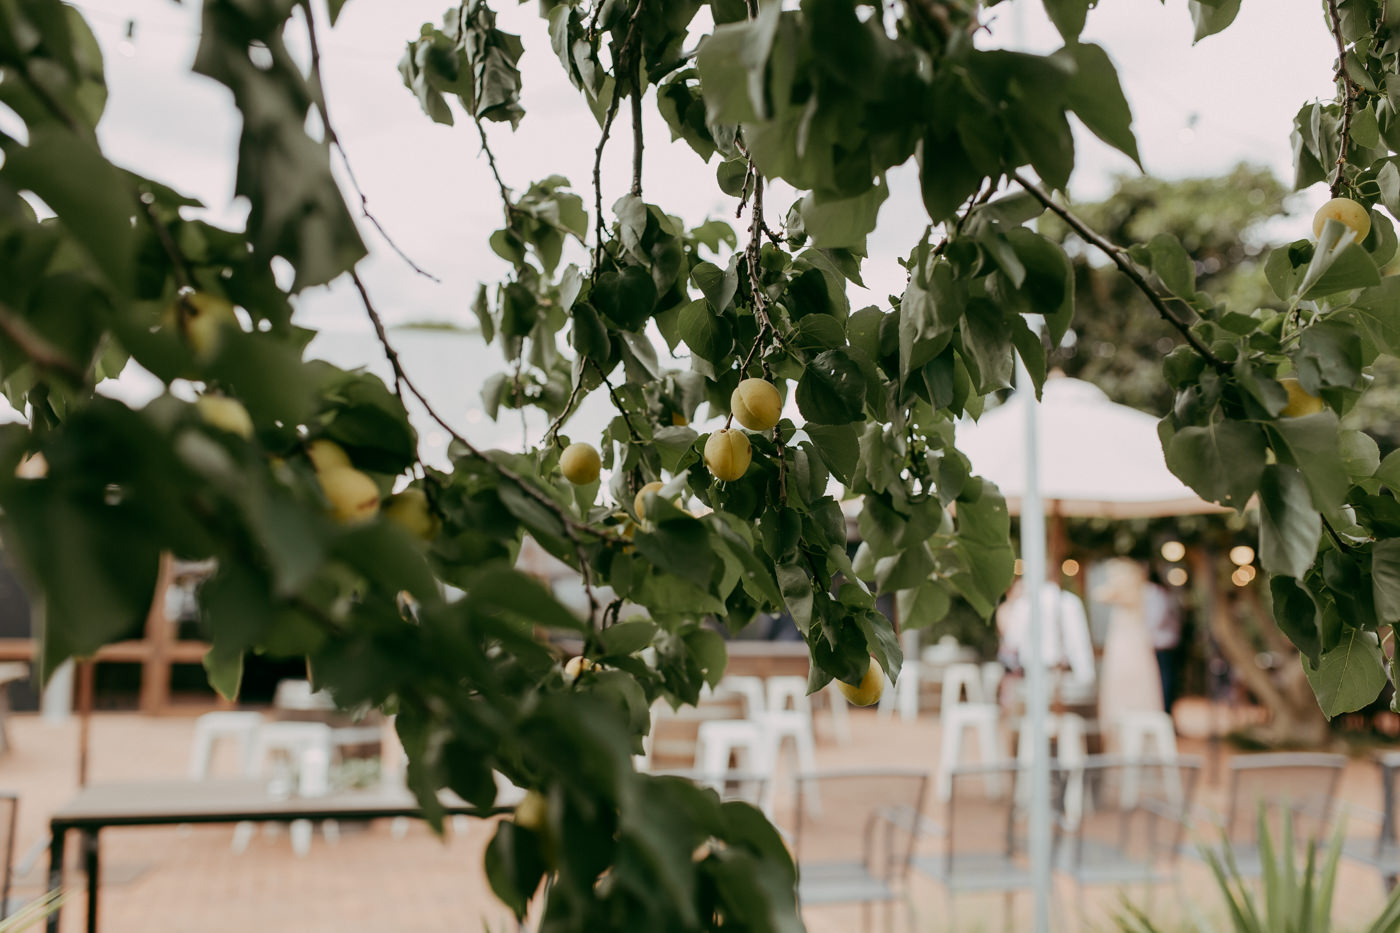 Anthony & Eliet - Wagga Wagga Wedding - Country NSW - Samantha Heather Photography-116.jpg